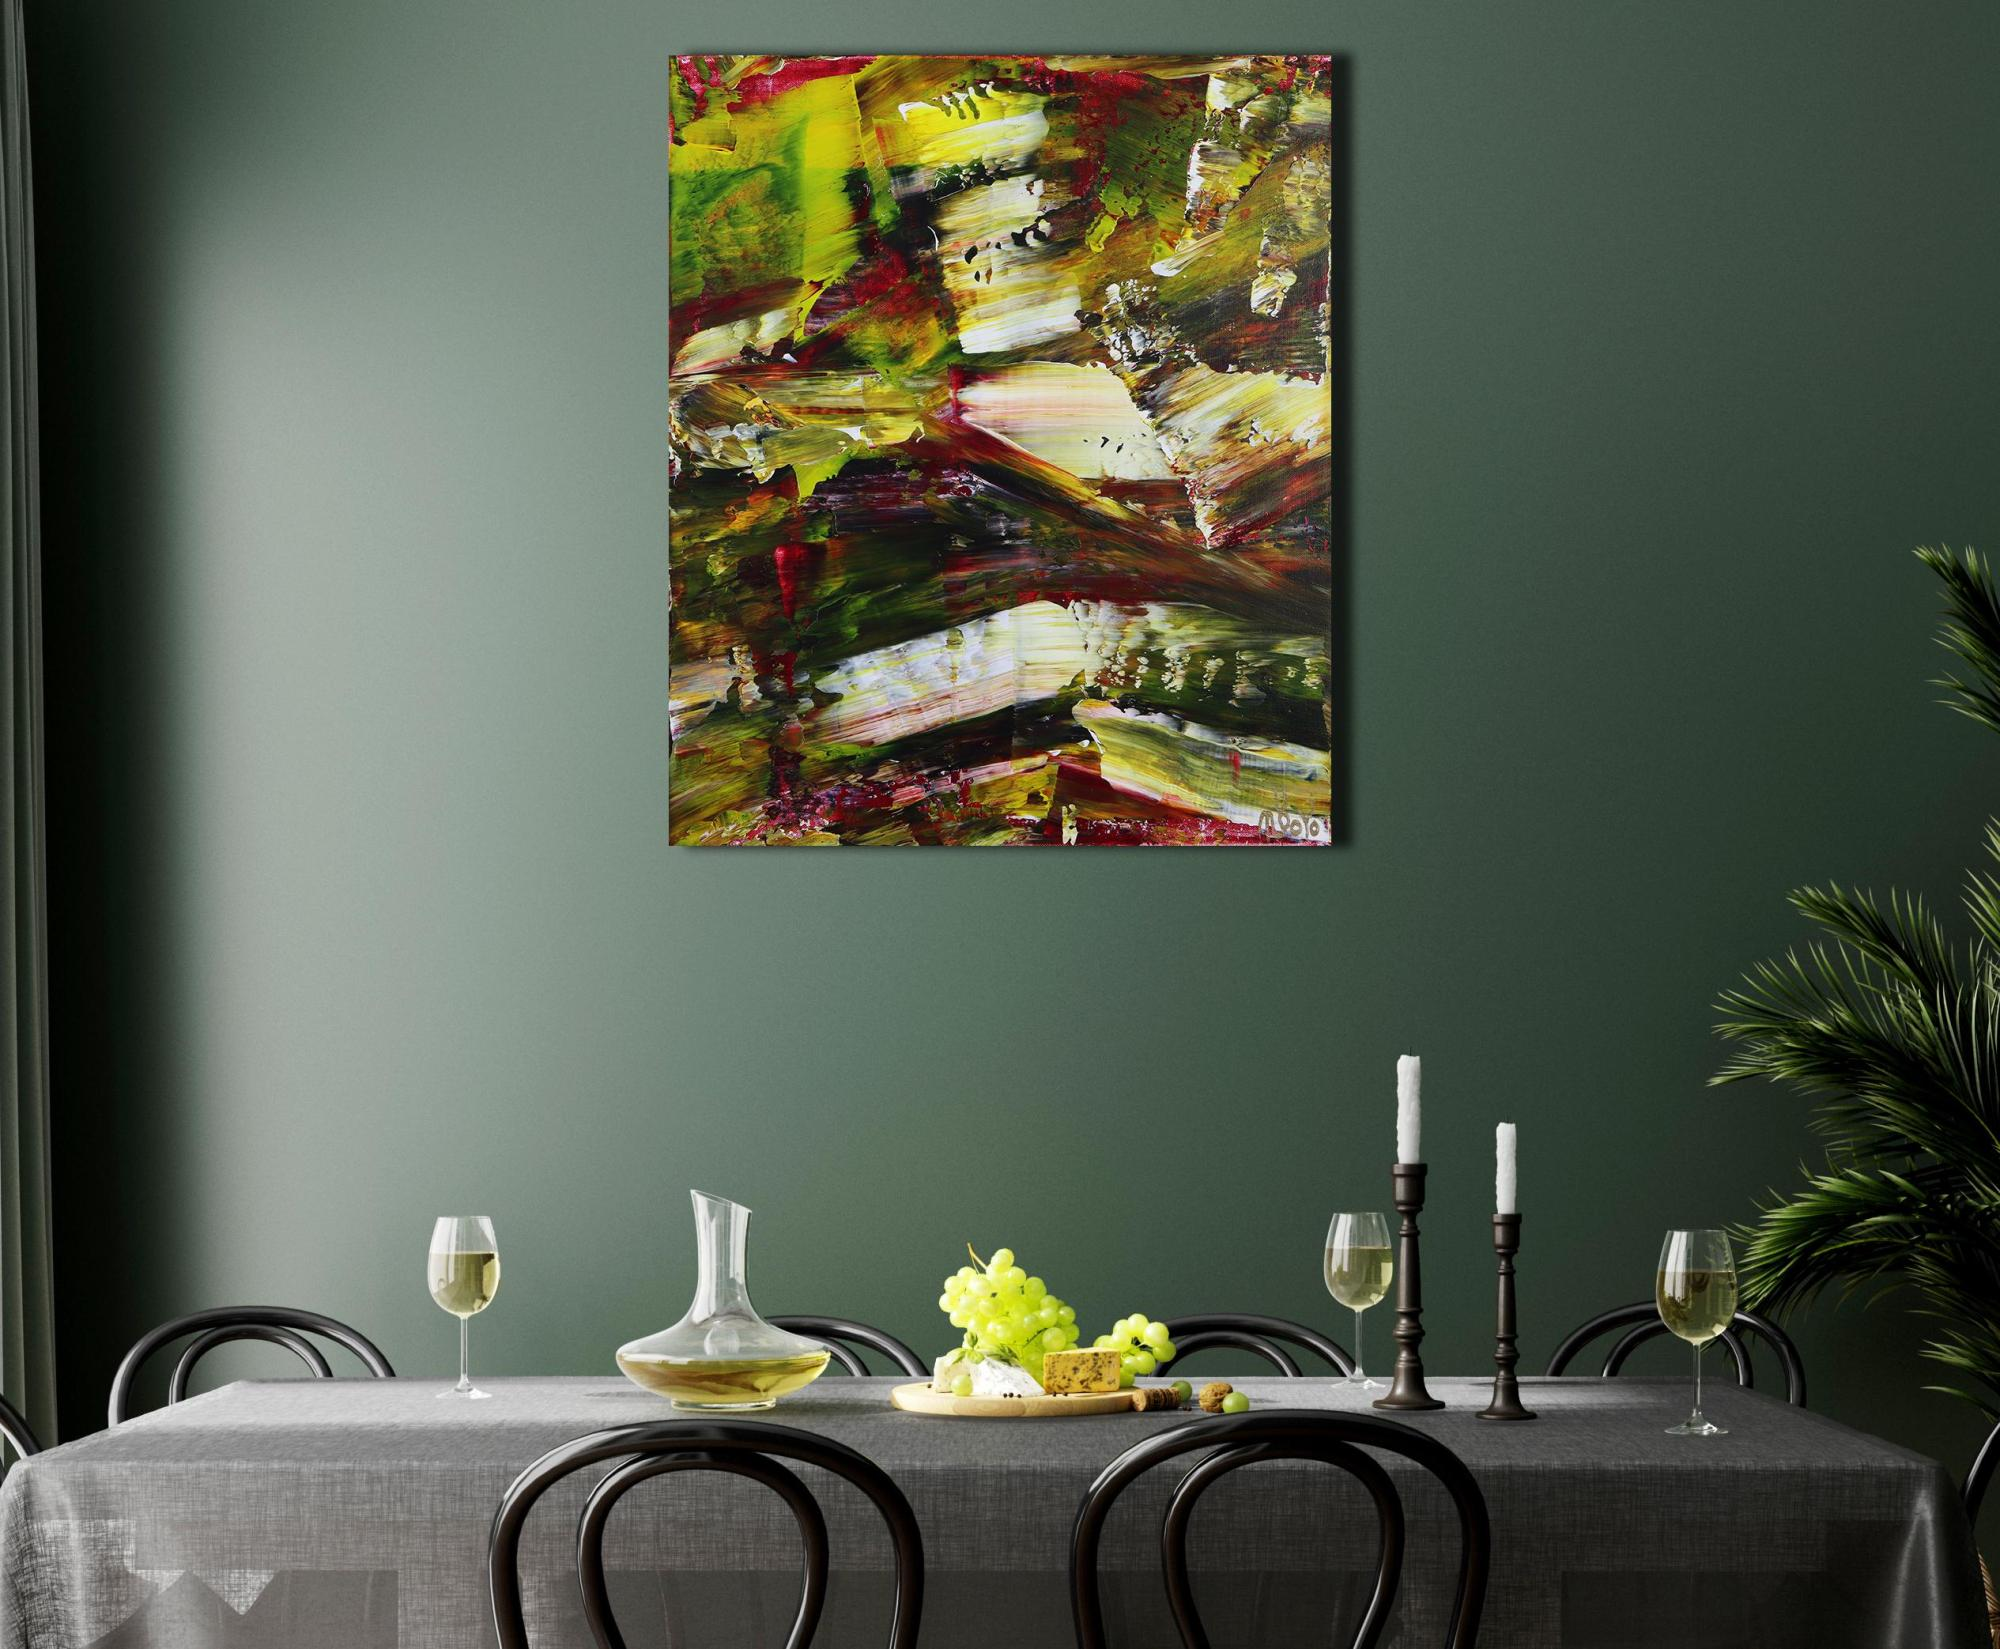 Room example / Moss and Rust (2021) 20x24 in / Artist: Nestor Toro